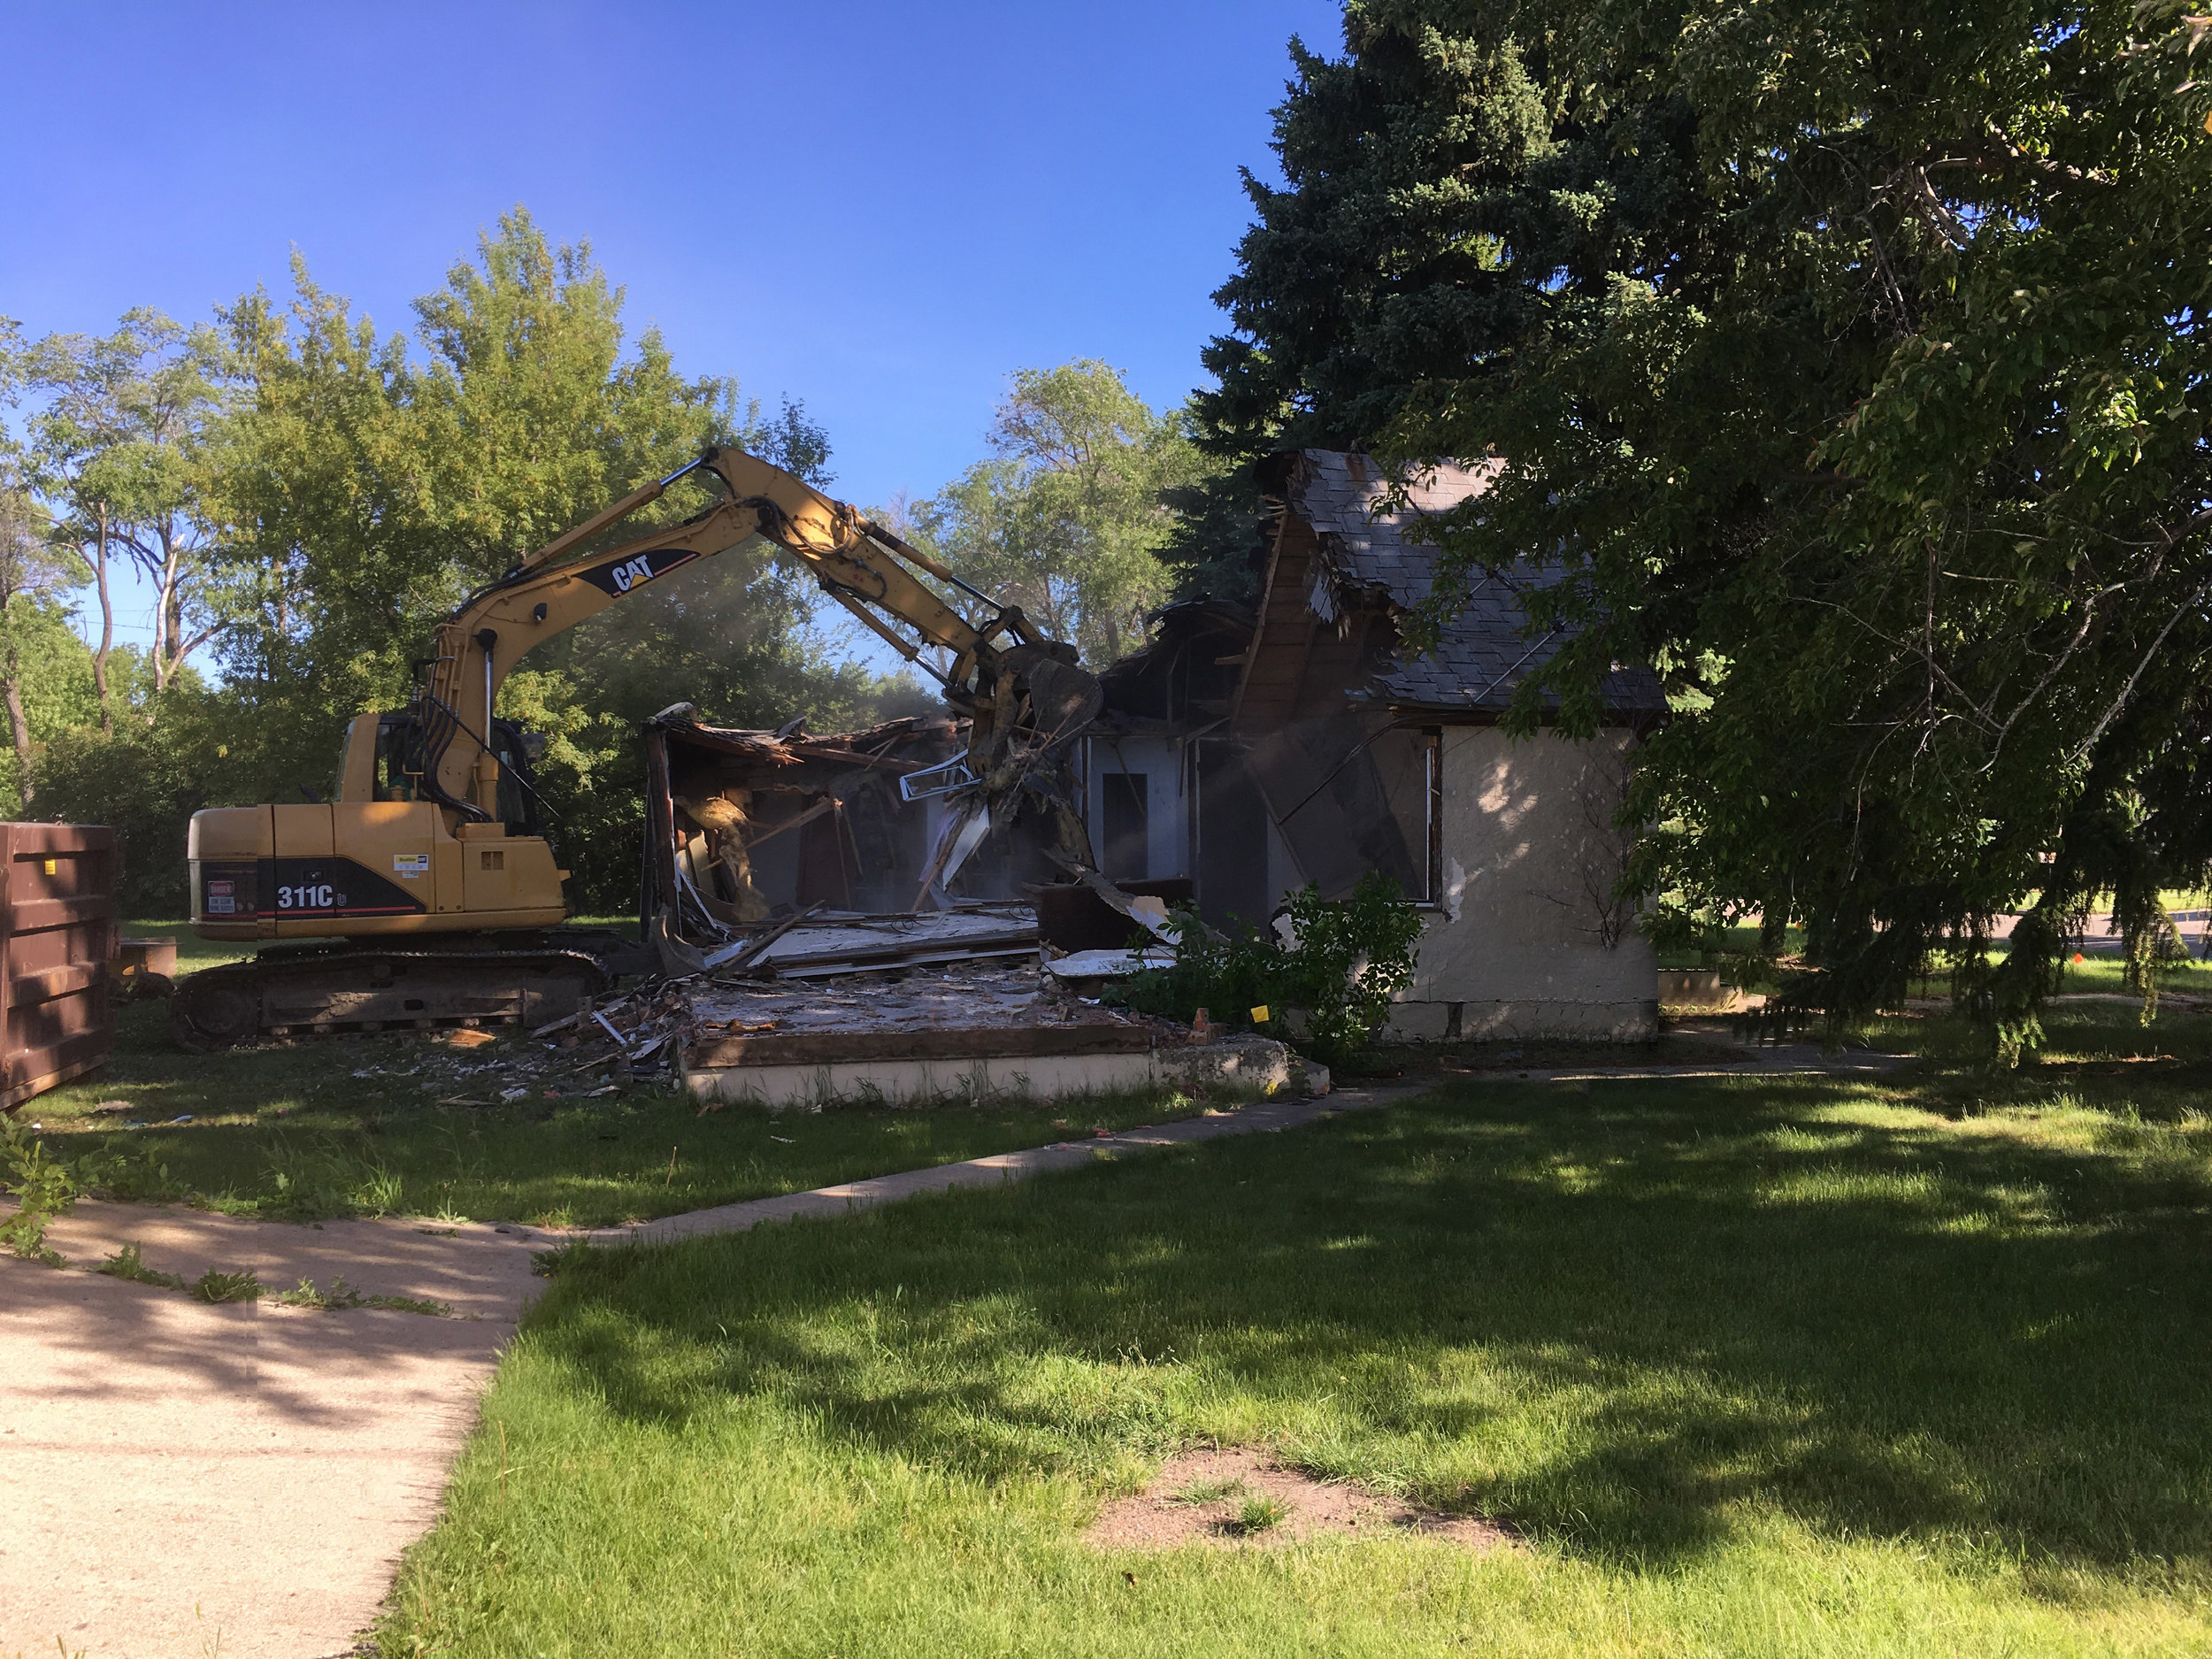 House Demo 5 (PHOTOSHOP).jpg